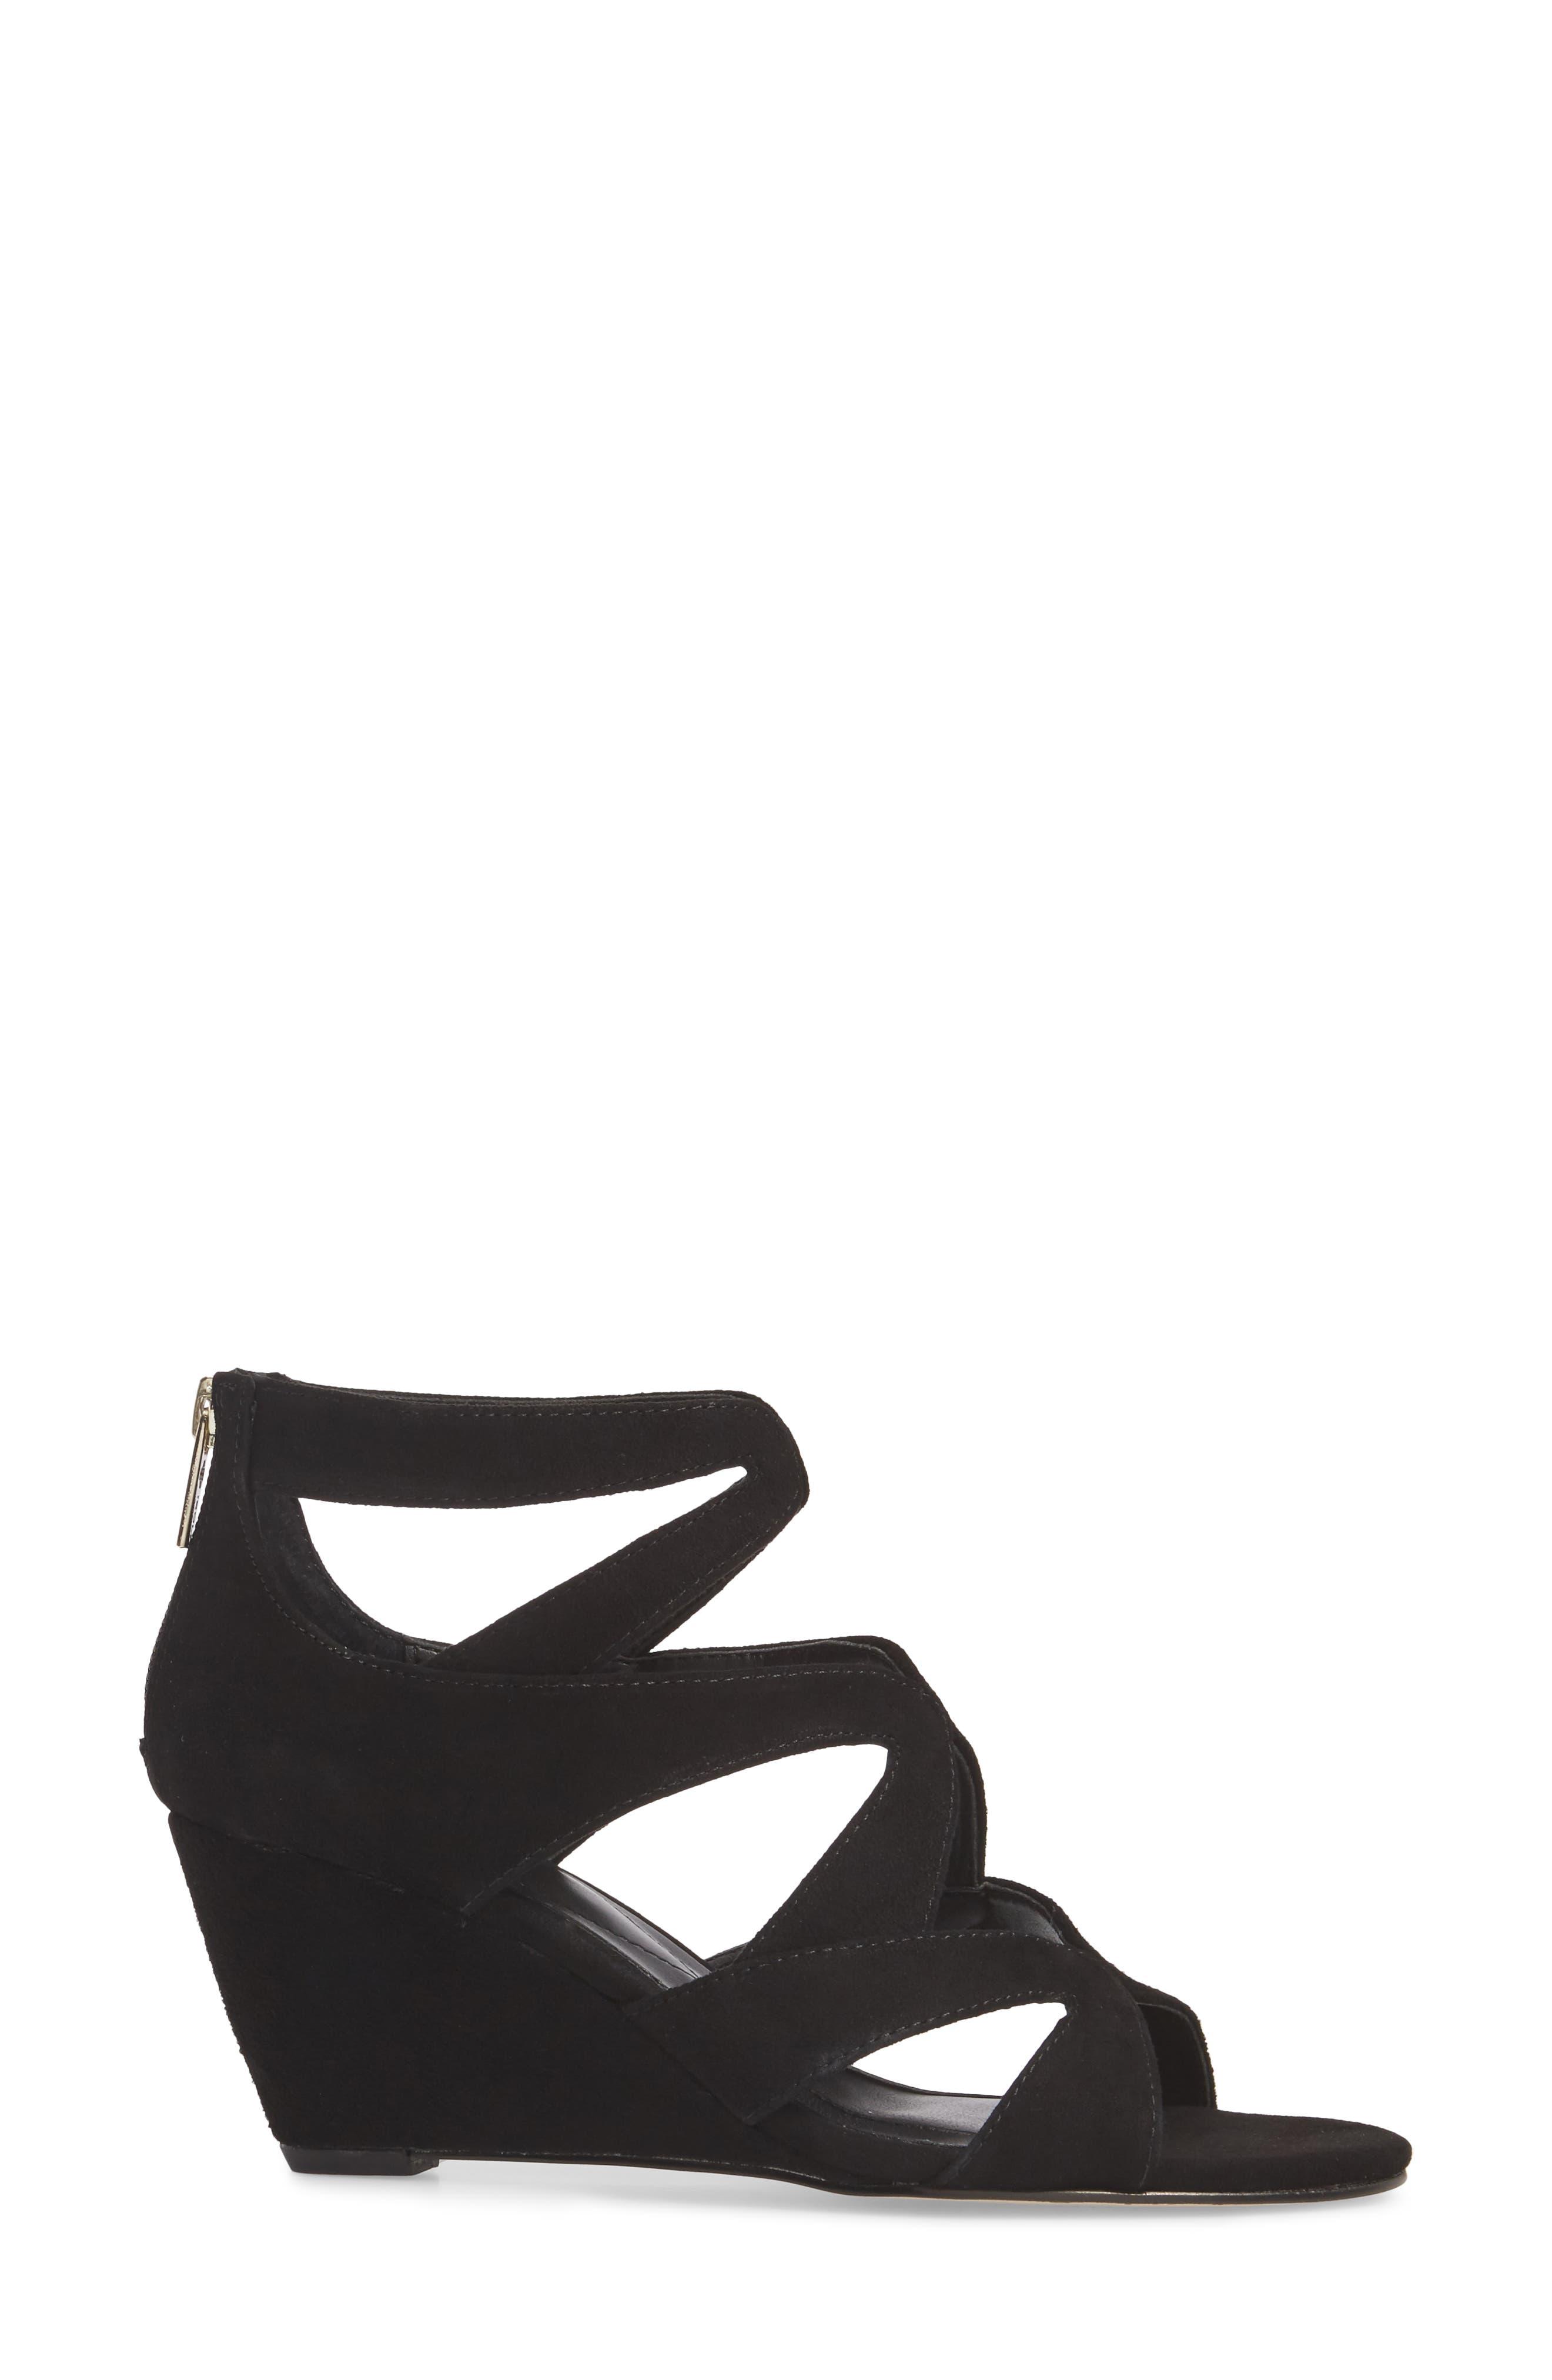 Filisha Wedge Sandal,                             Alternate thumbnail 3, color,                             BLACK SUEDE